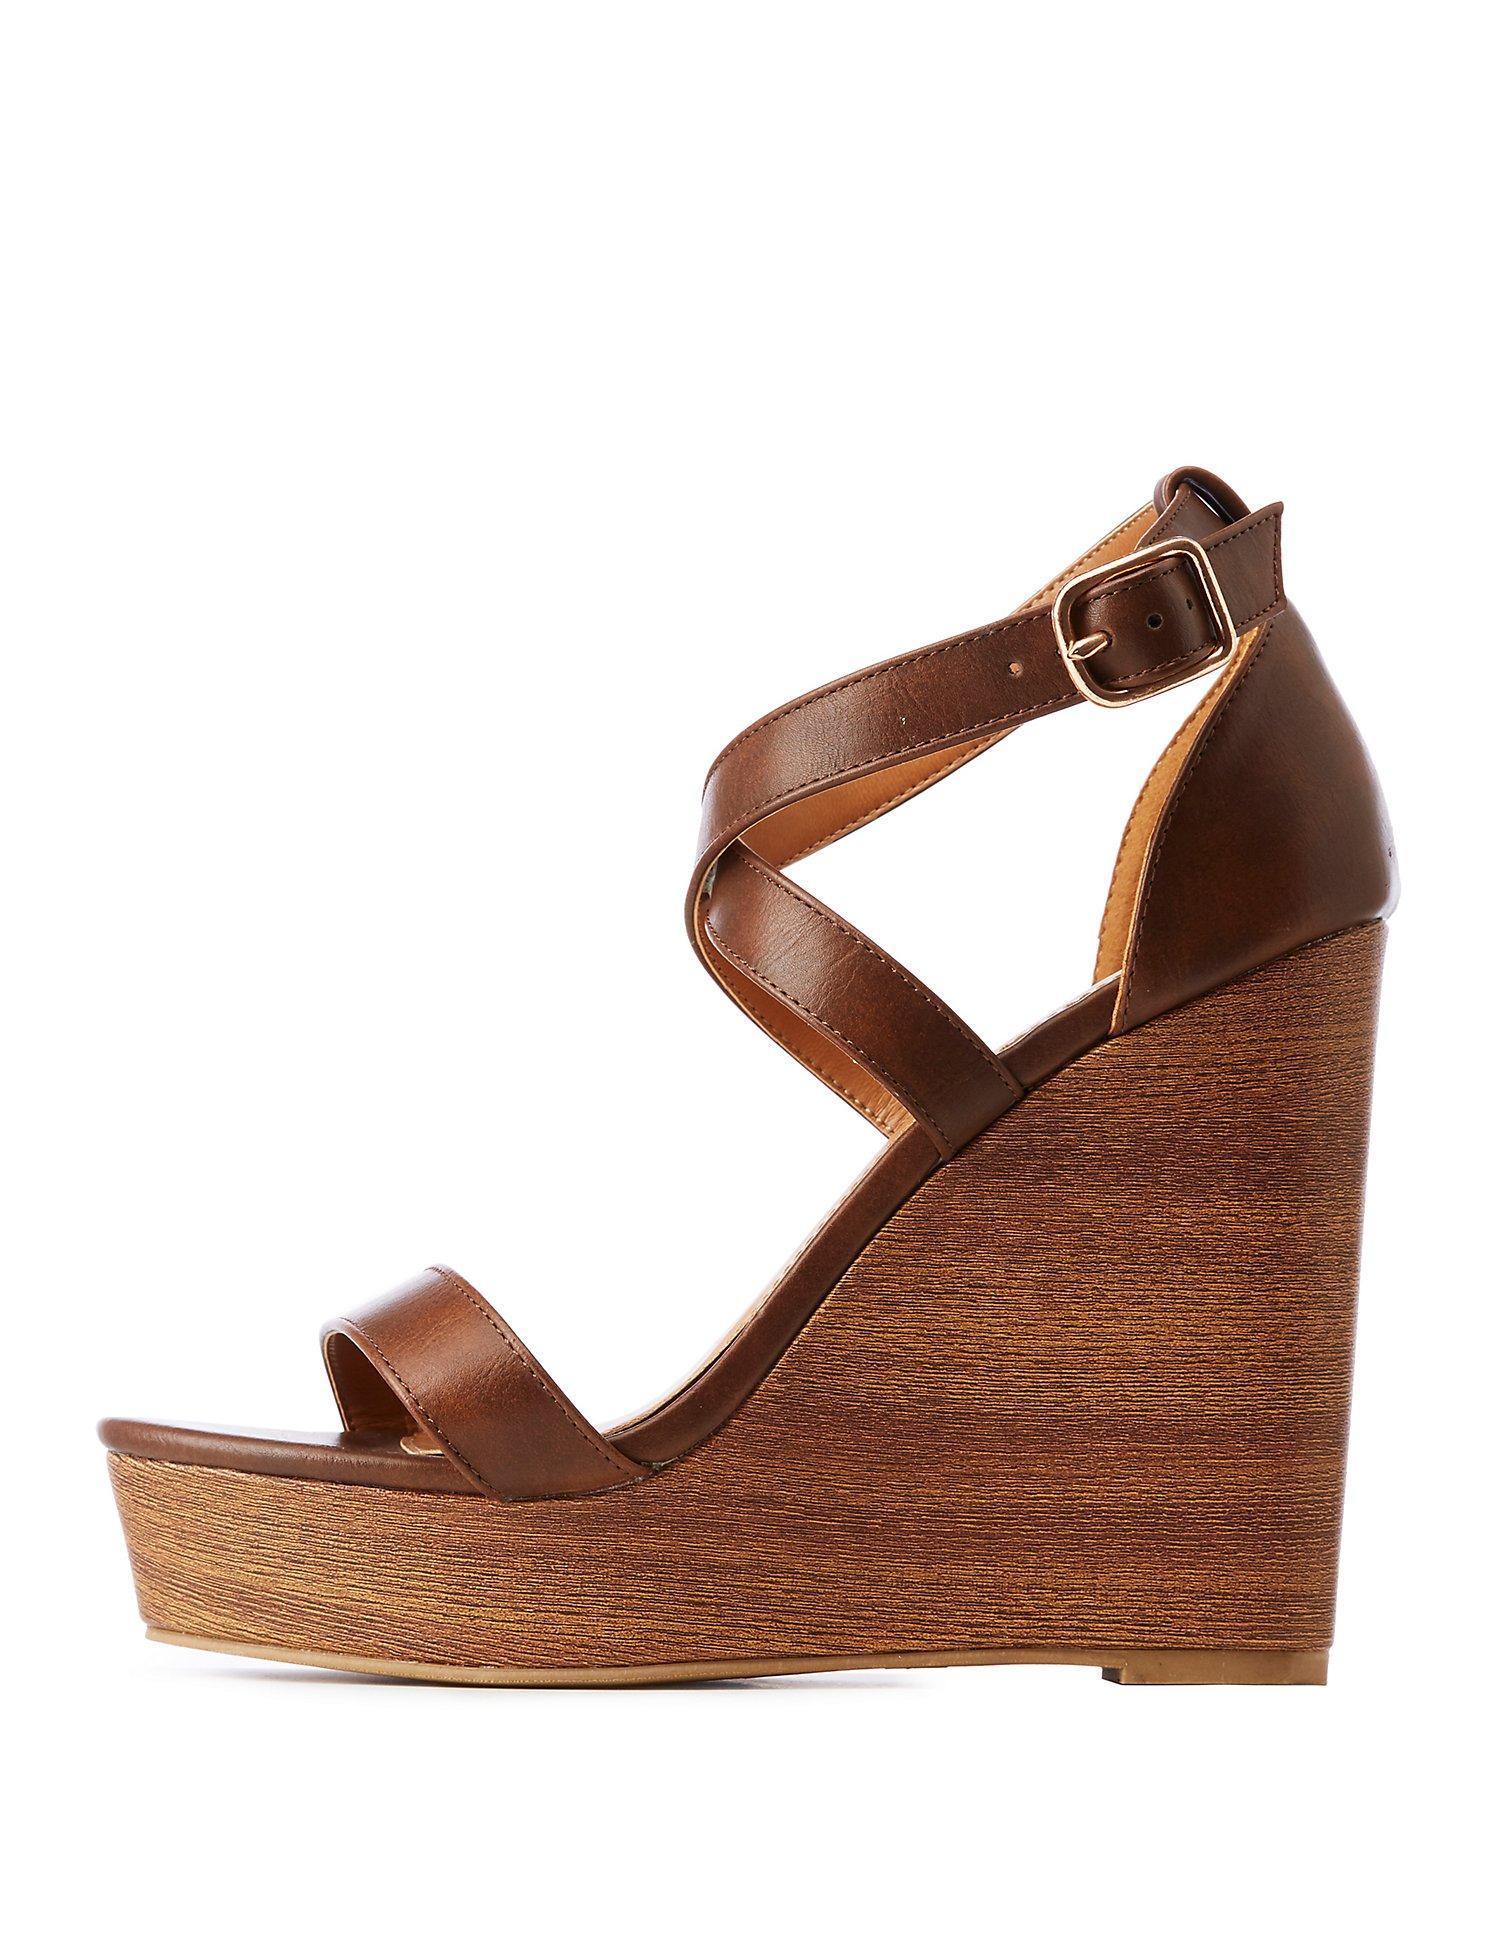 43db001b9565 Lyst charlotte russe crisscross wood wedge sandals in brown jpg 1500x1941 Charlotte  russe wedge sandals